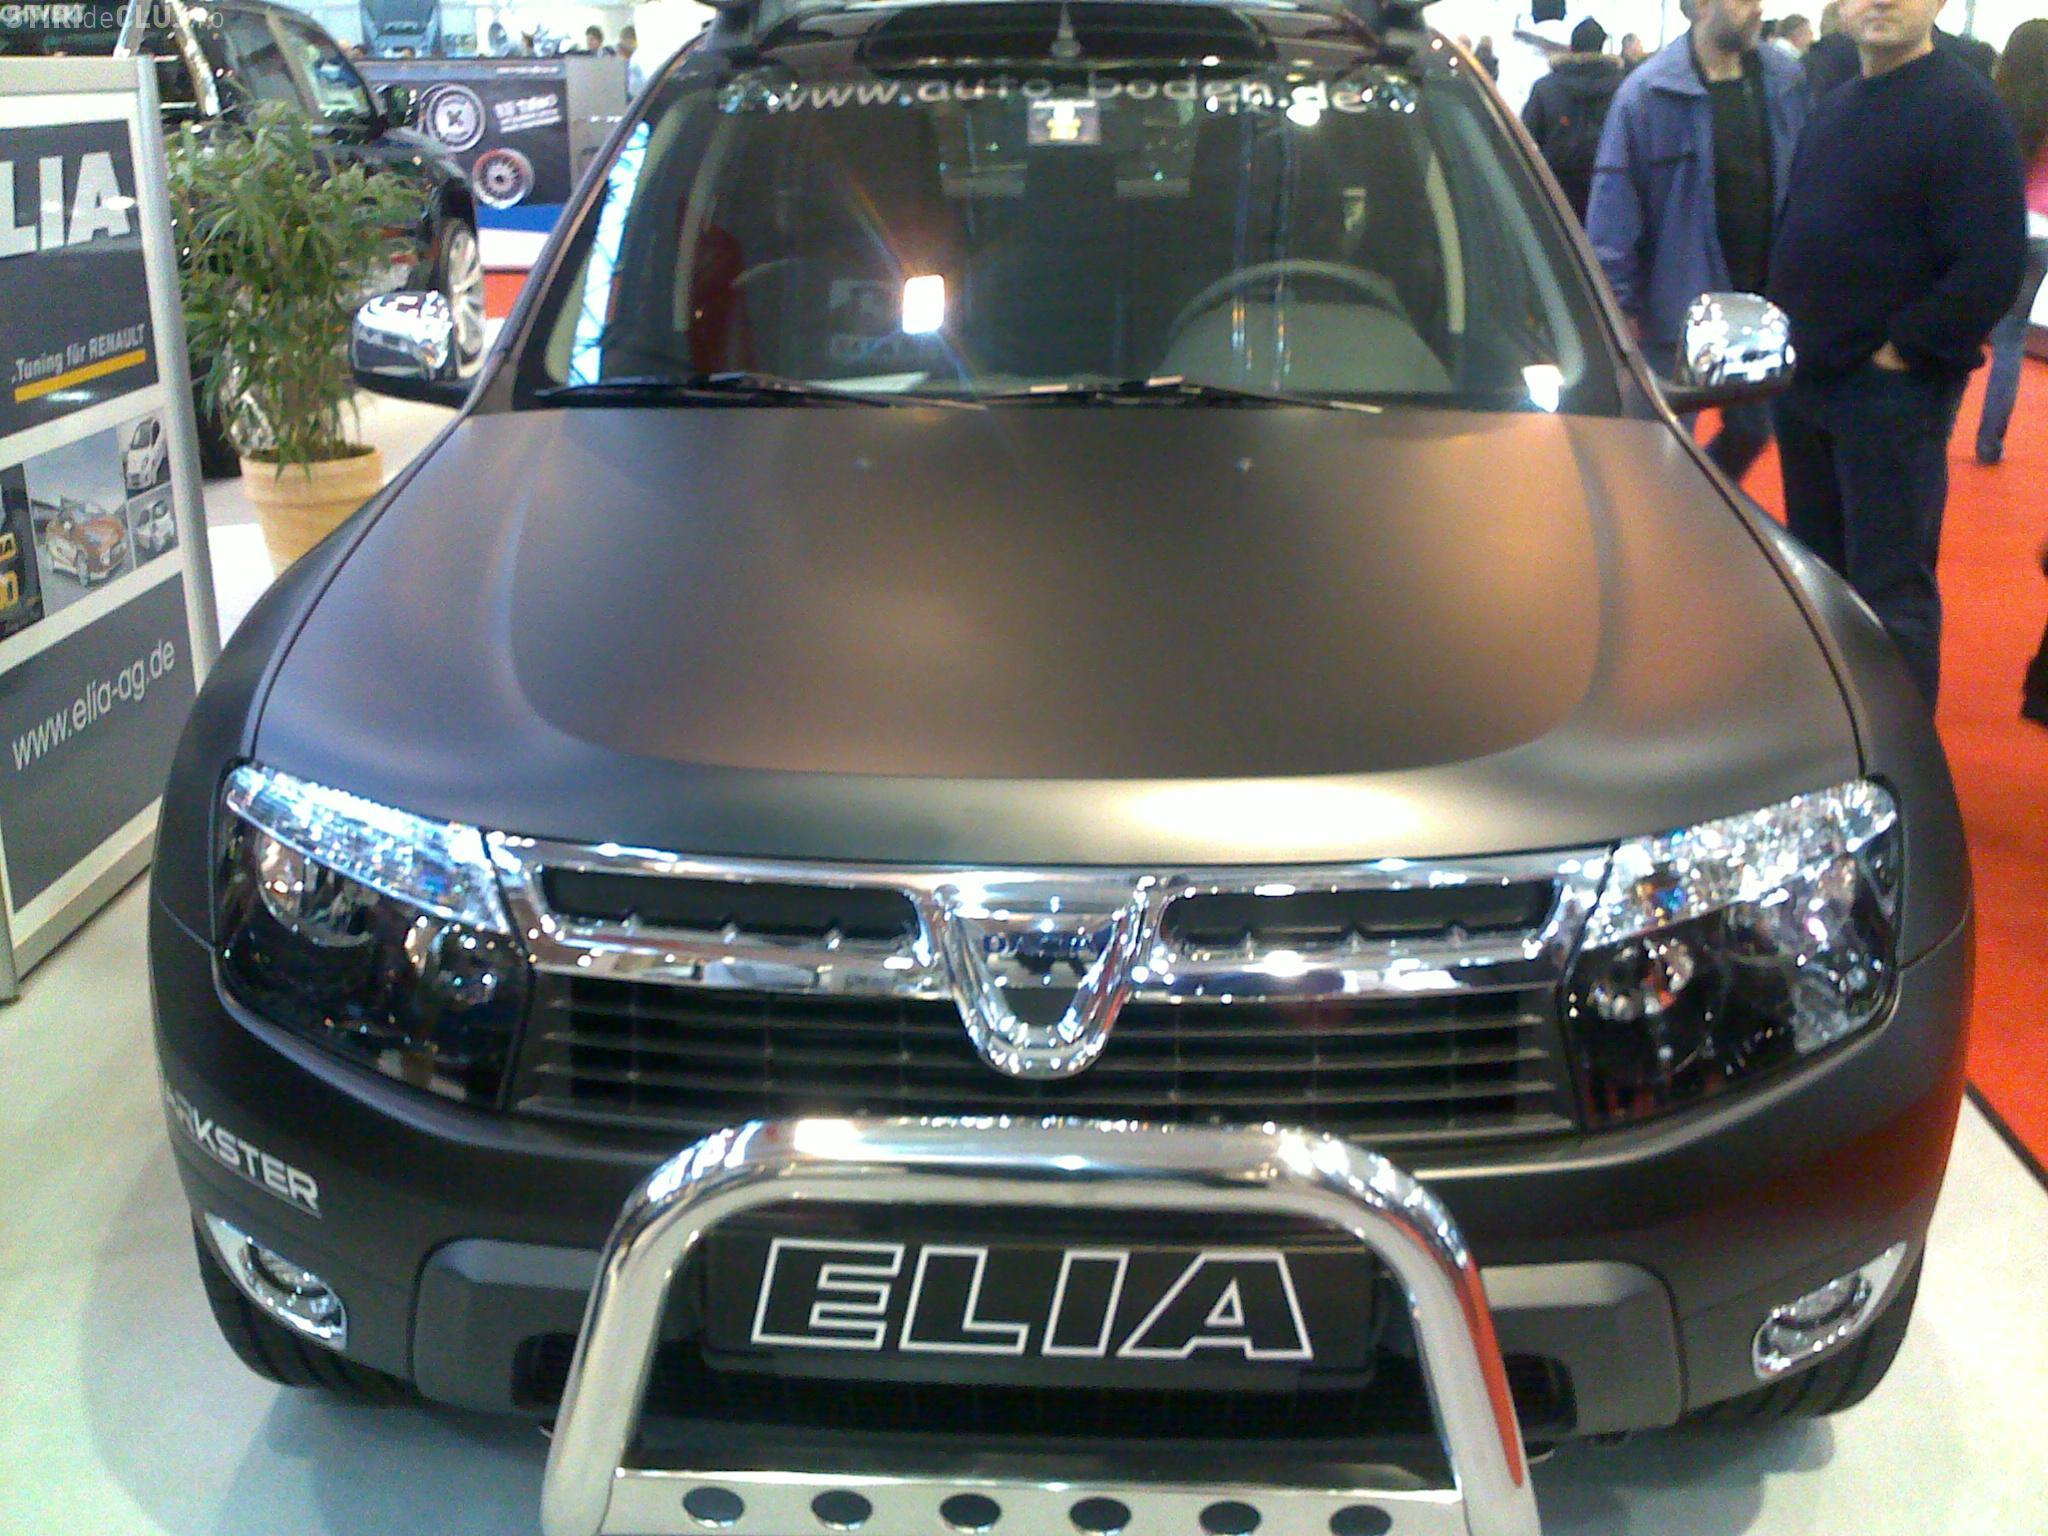 Dacia Duster face senzatie la show-ul auto de la Essen. Vezi cum arata un Duster tunat FOTO